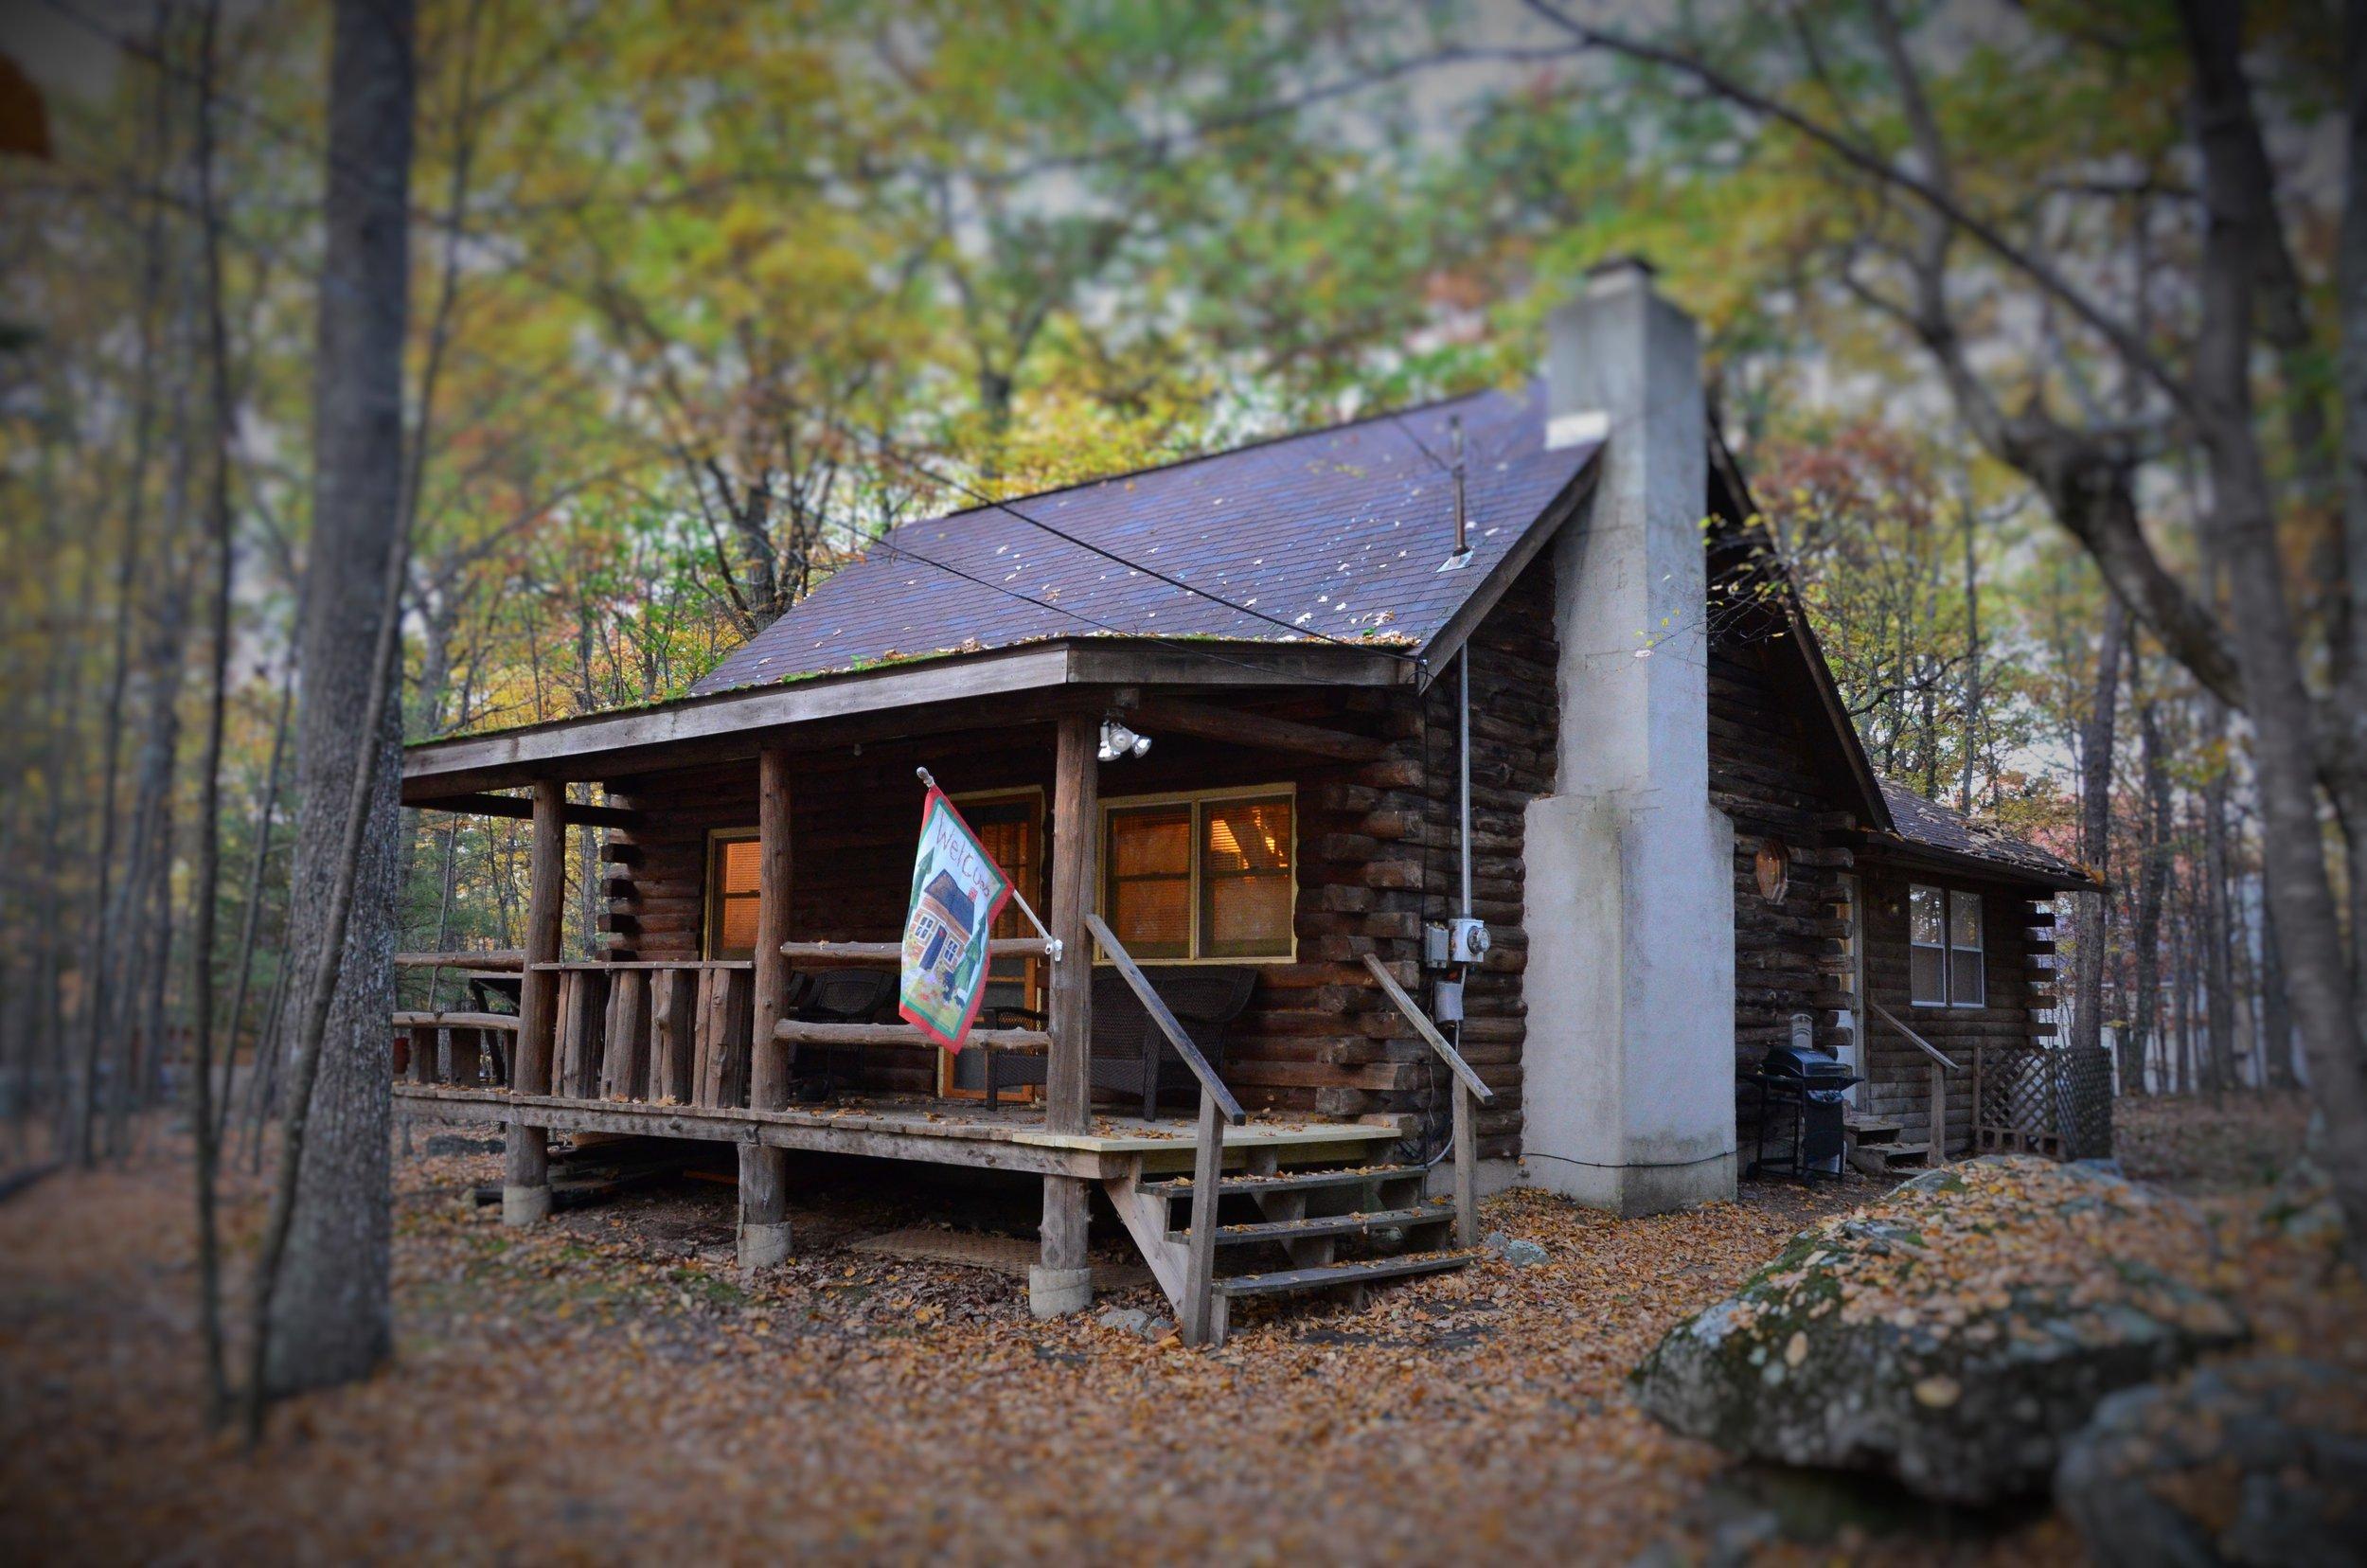 masthope log cabin  3 bedrooms PLUS LOFT, 2 bathrooms